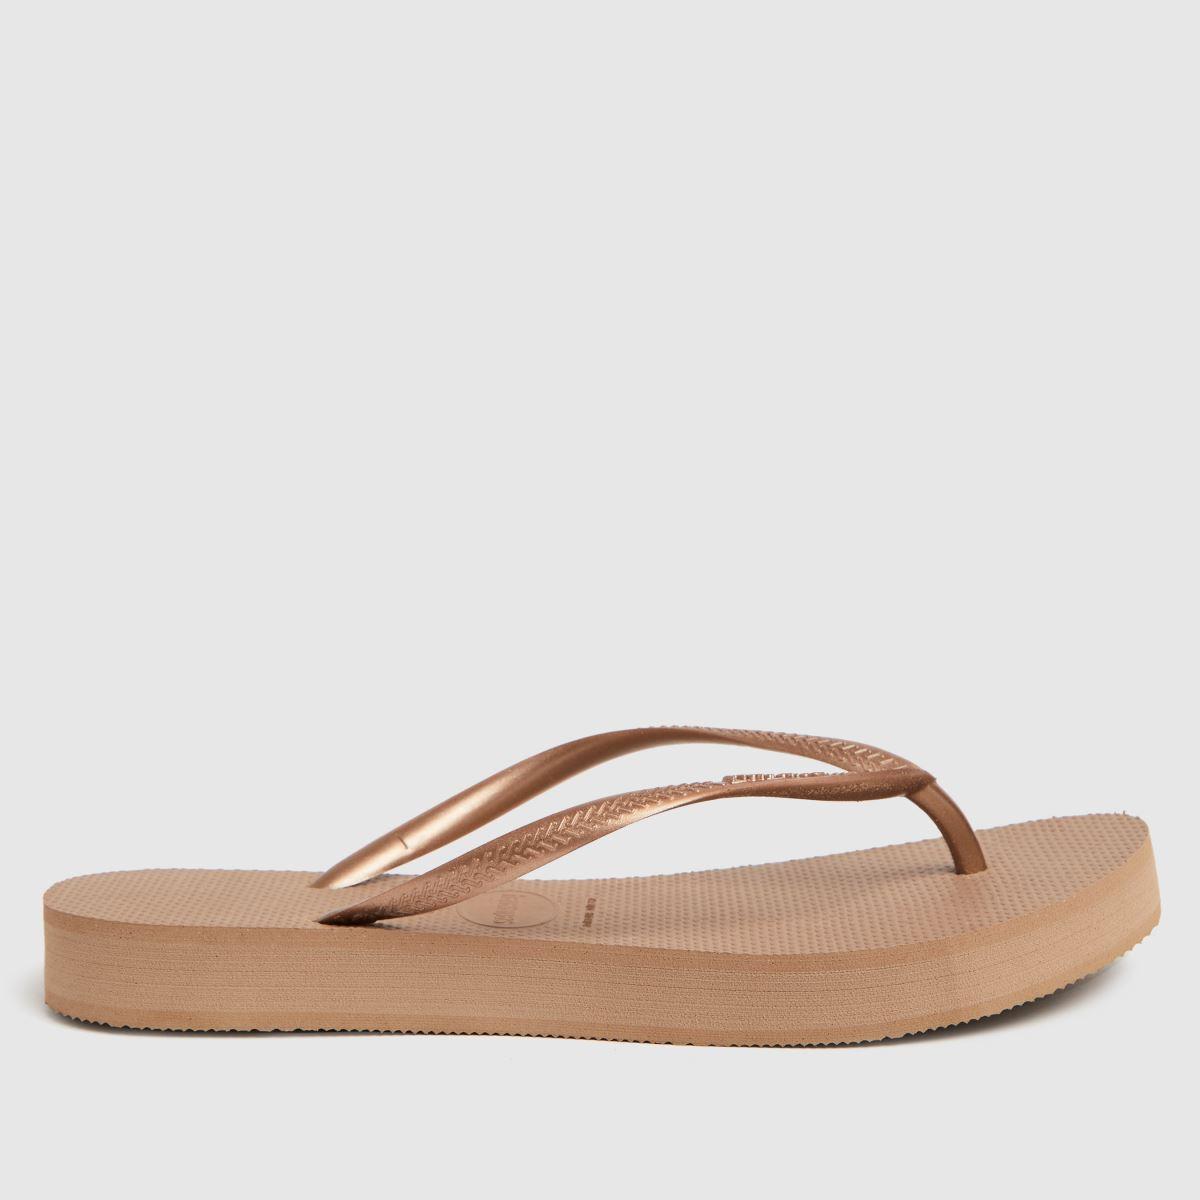 Havaianas Pale Pink Slim Flatform Sandals